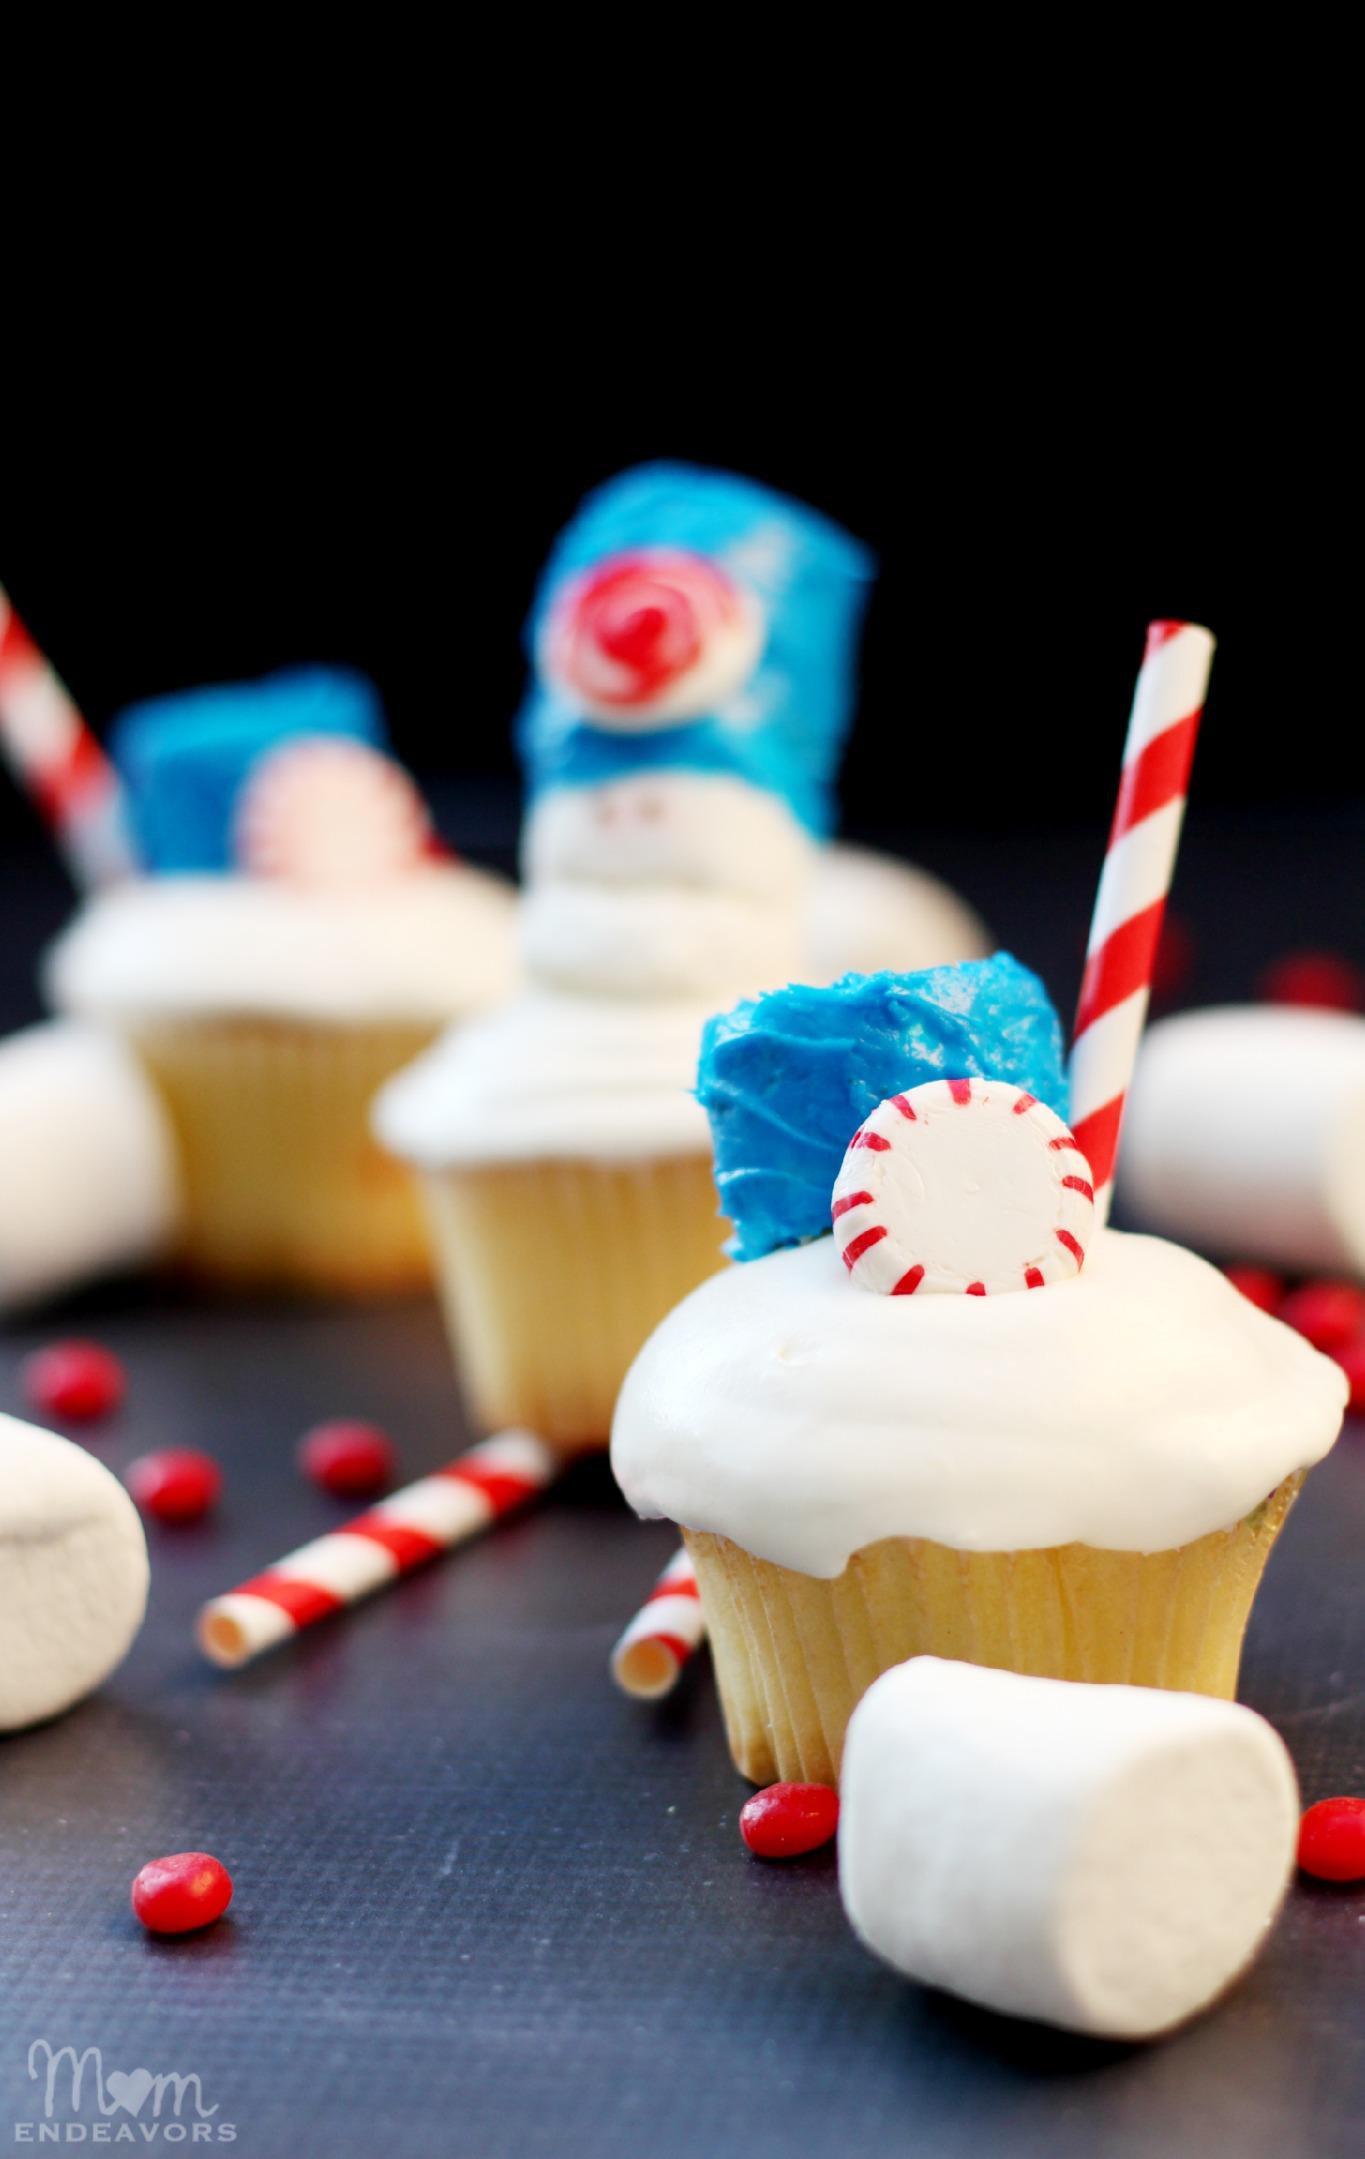 Marshmallow Creme Cupcakes